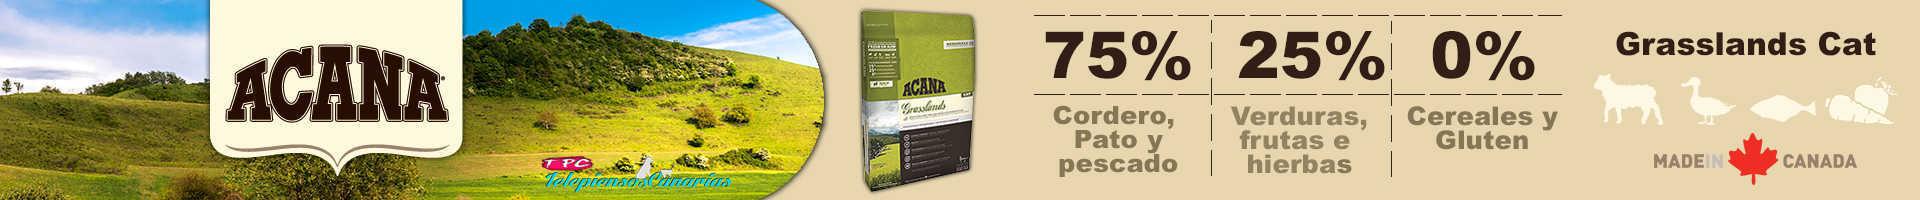 Acana grasslands cat and kitten, 75% de carne cordero